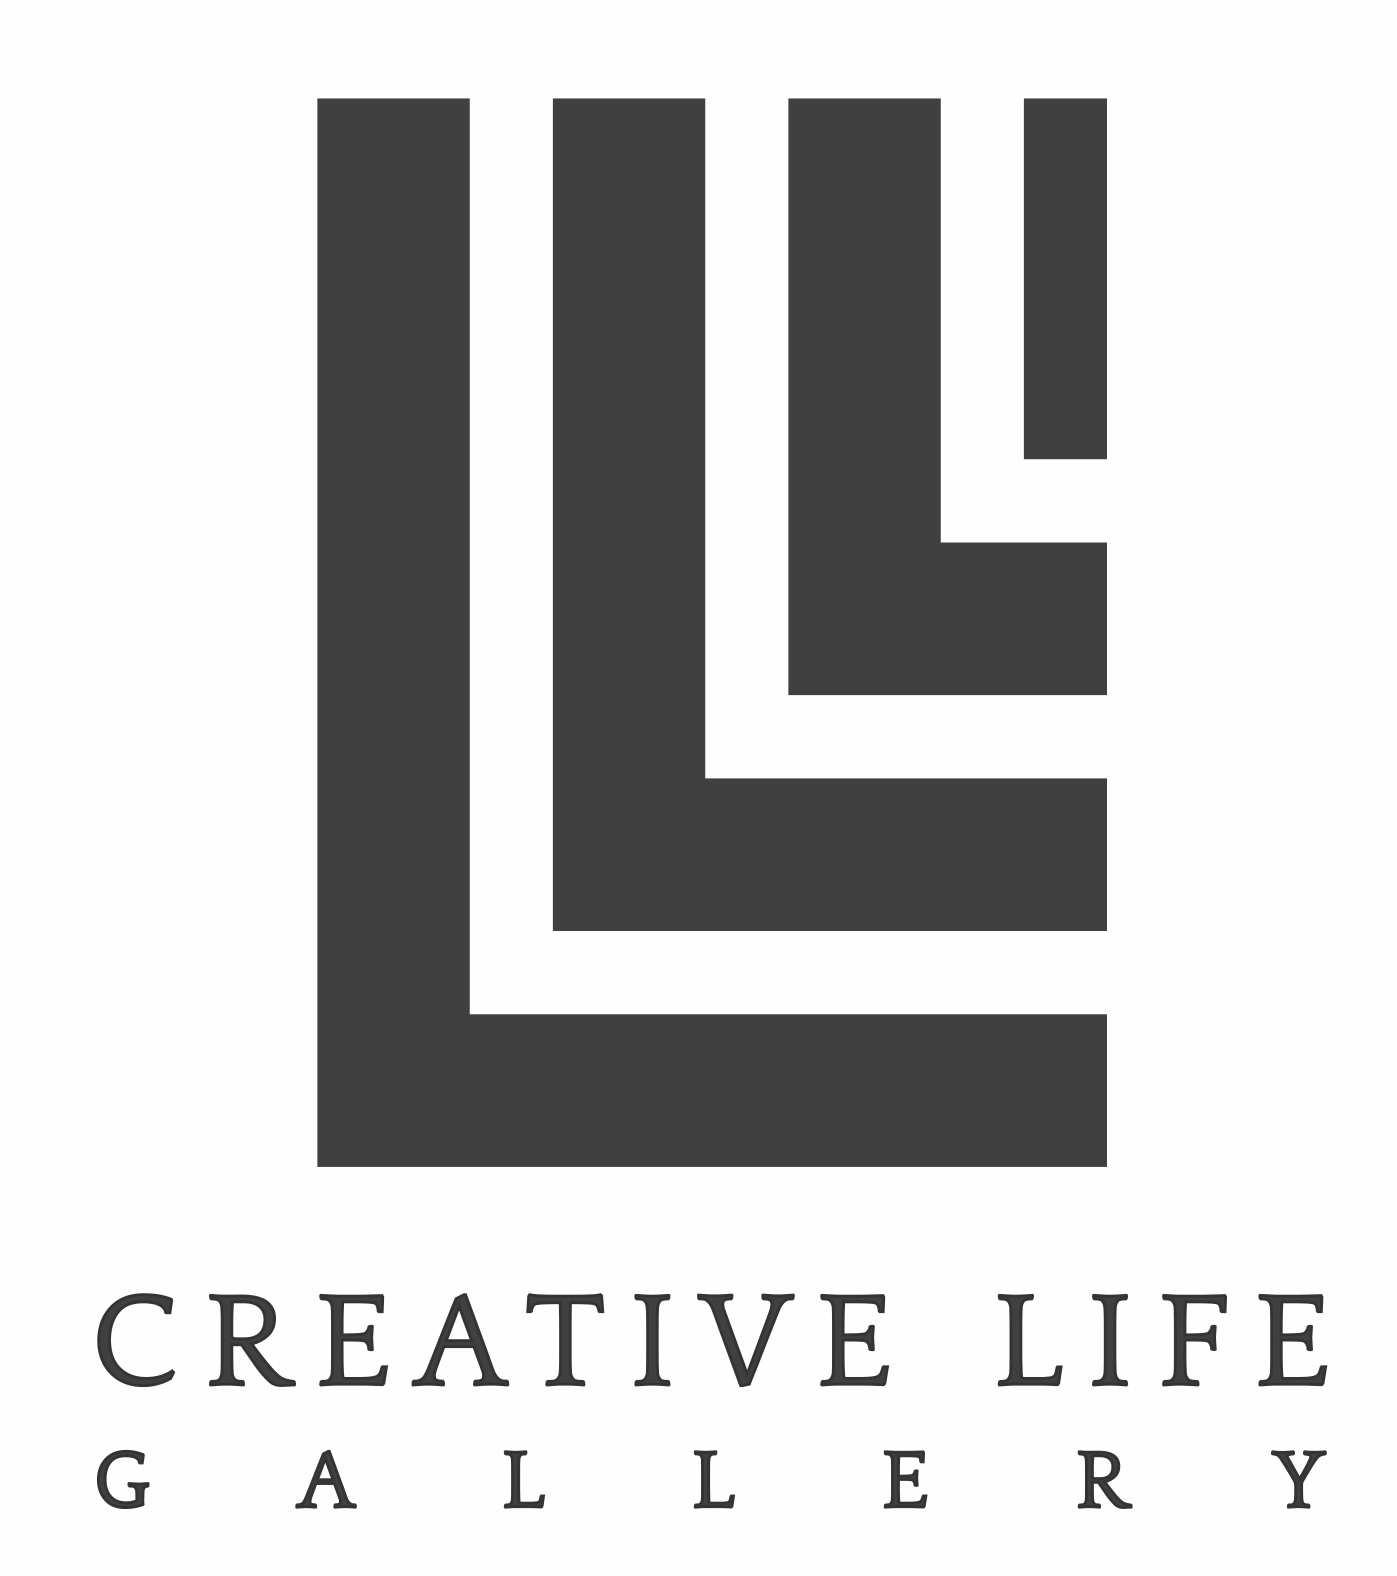 Creative Life Gallery